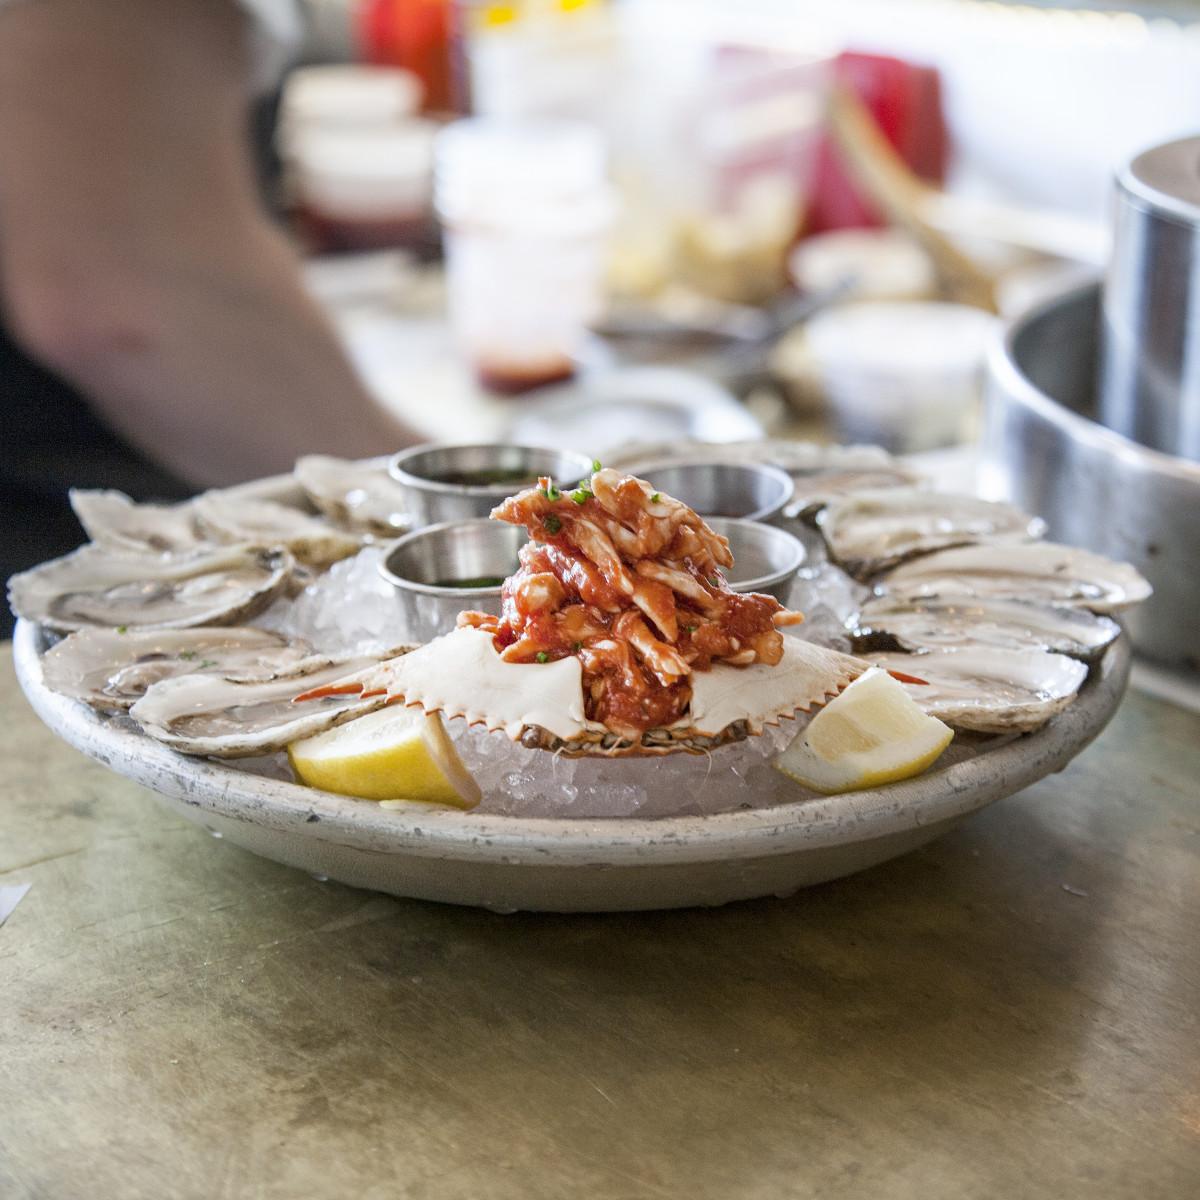 La Lucha oysters